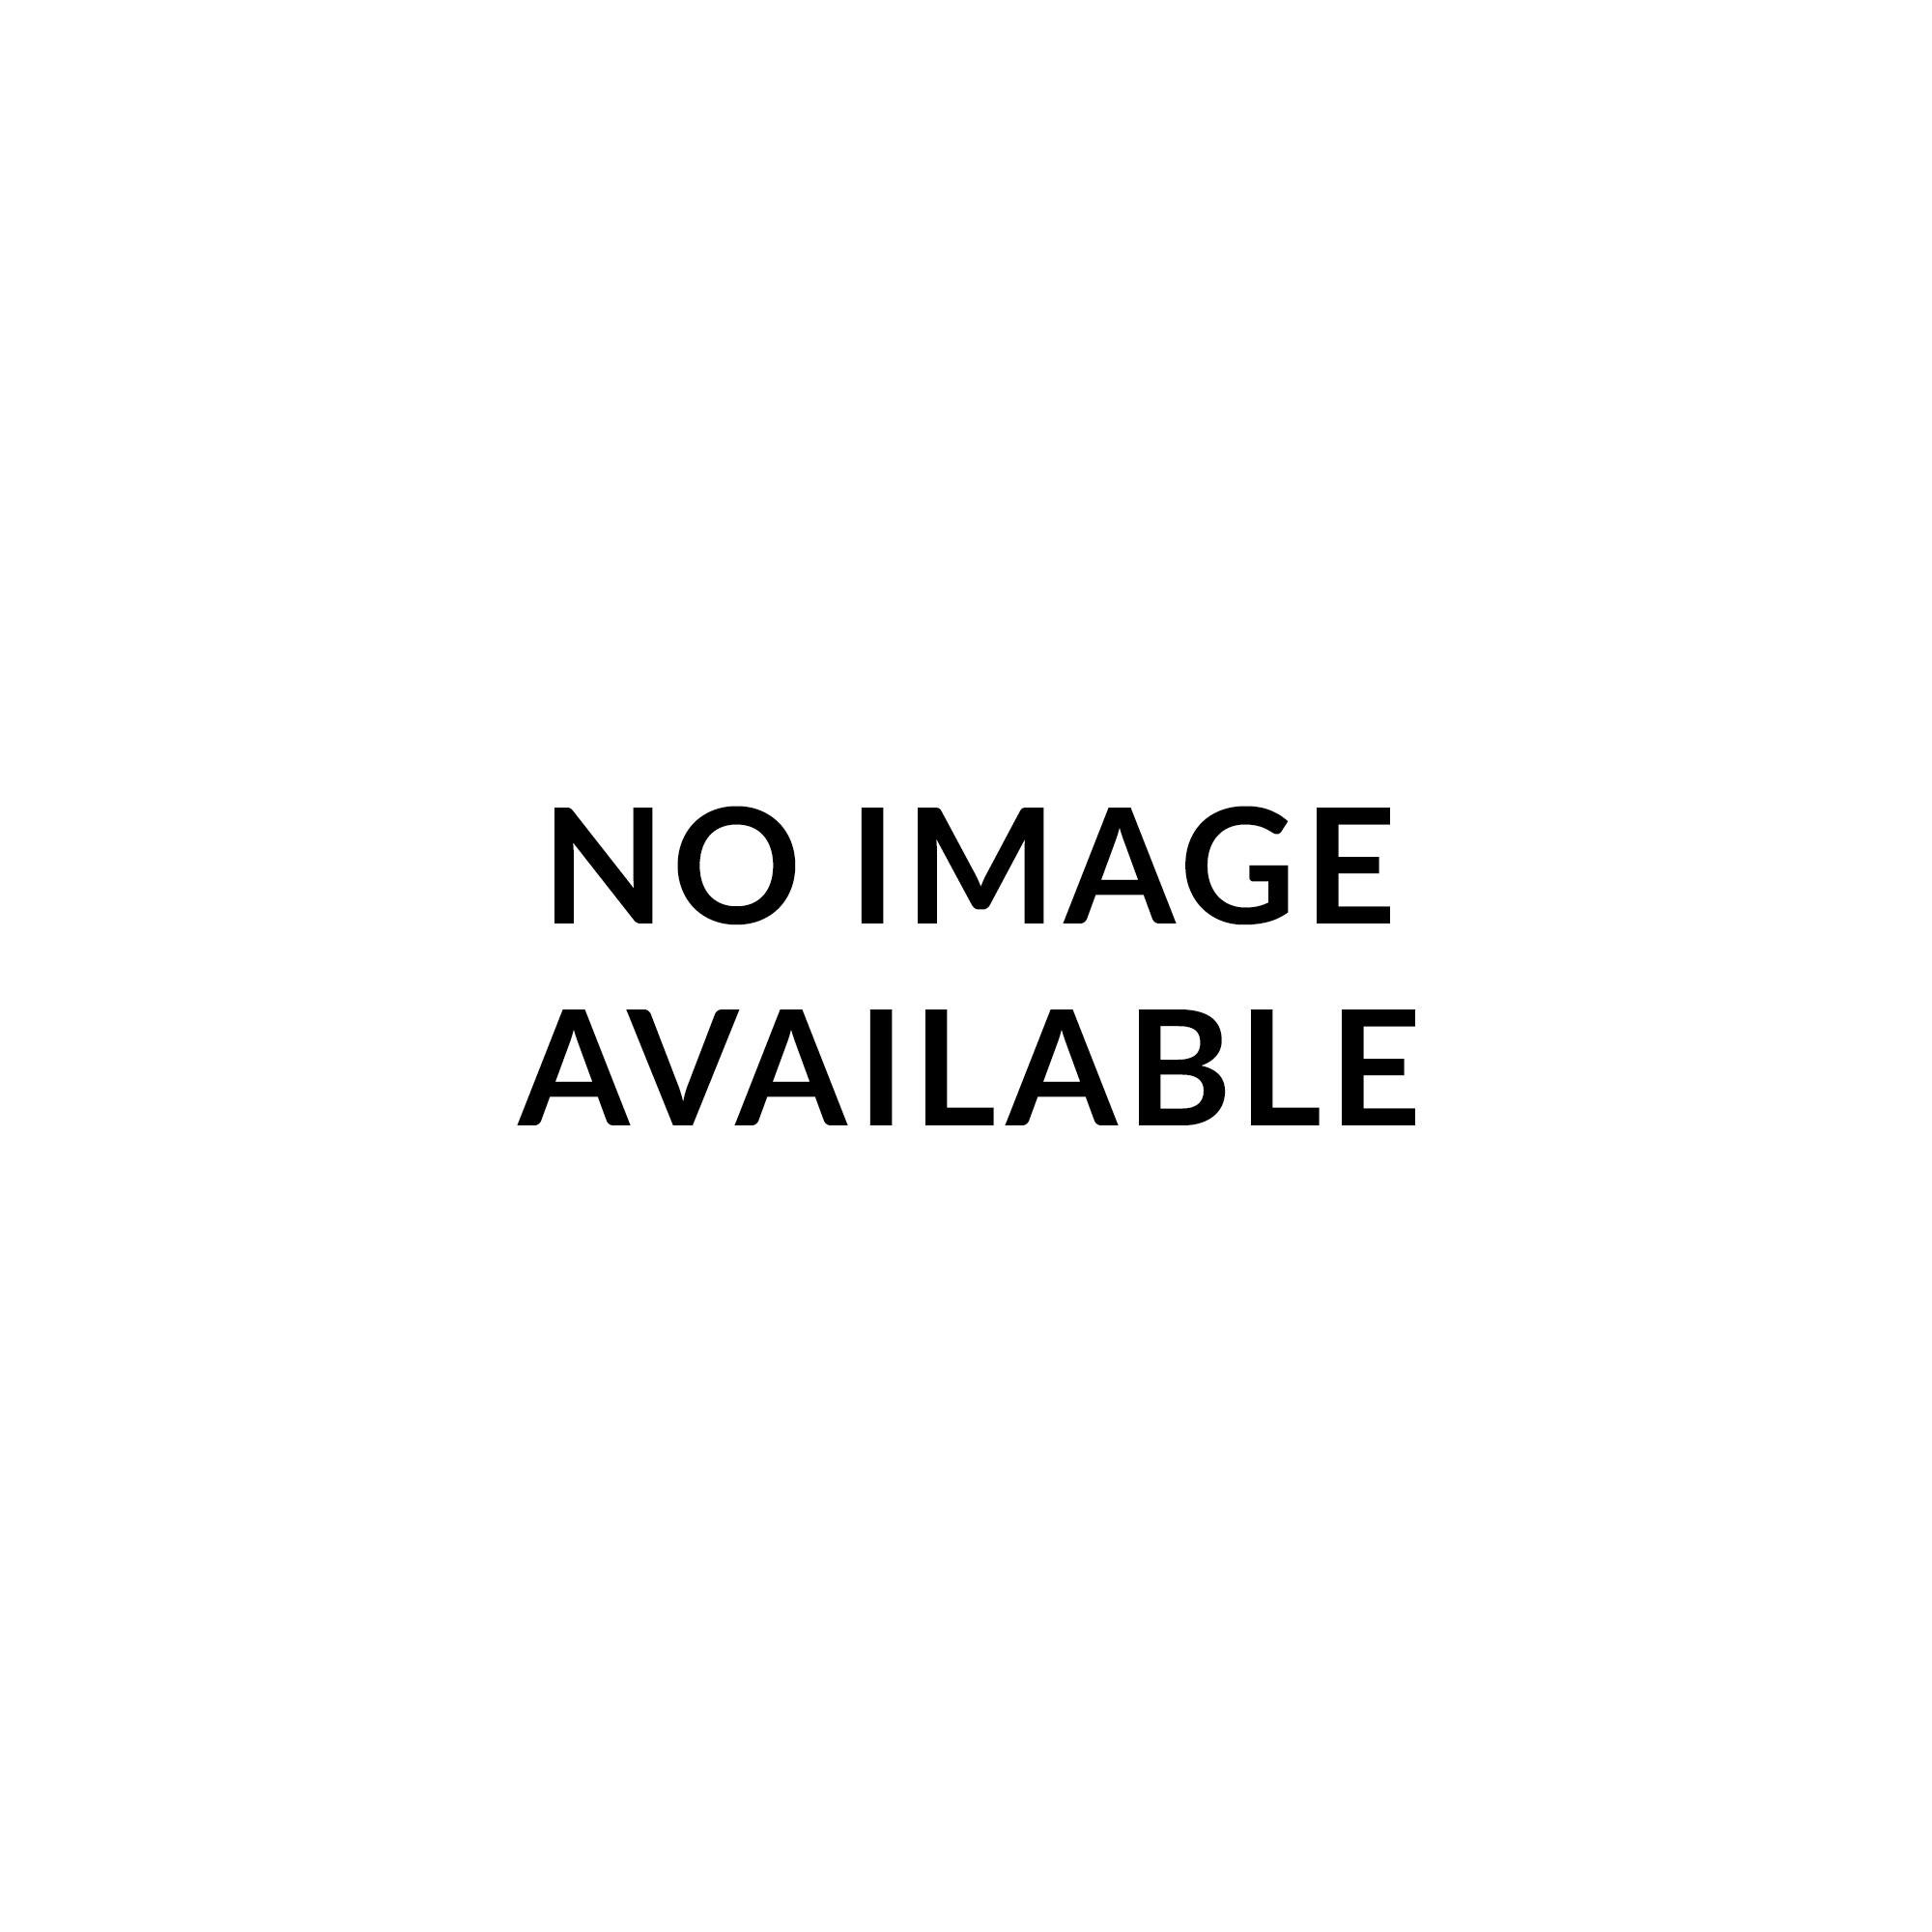 Seymour Duncan BLACKOUTS AHB-1s 8-String Active Humbucker Pickup Set, Black